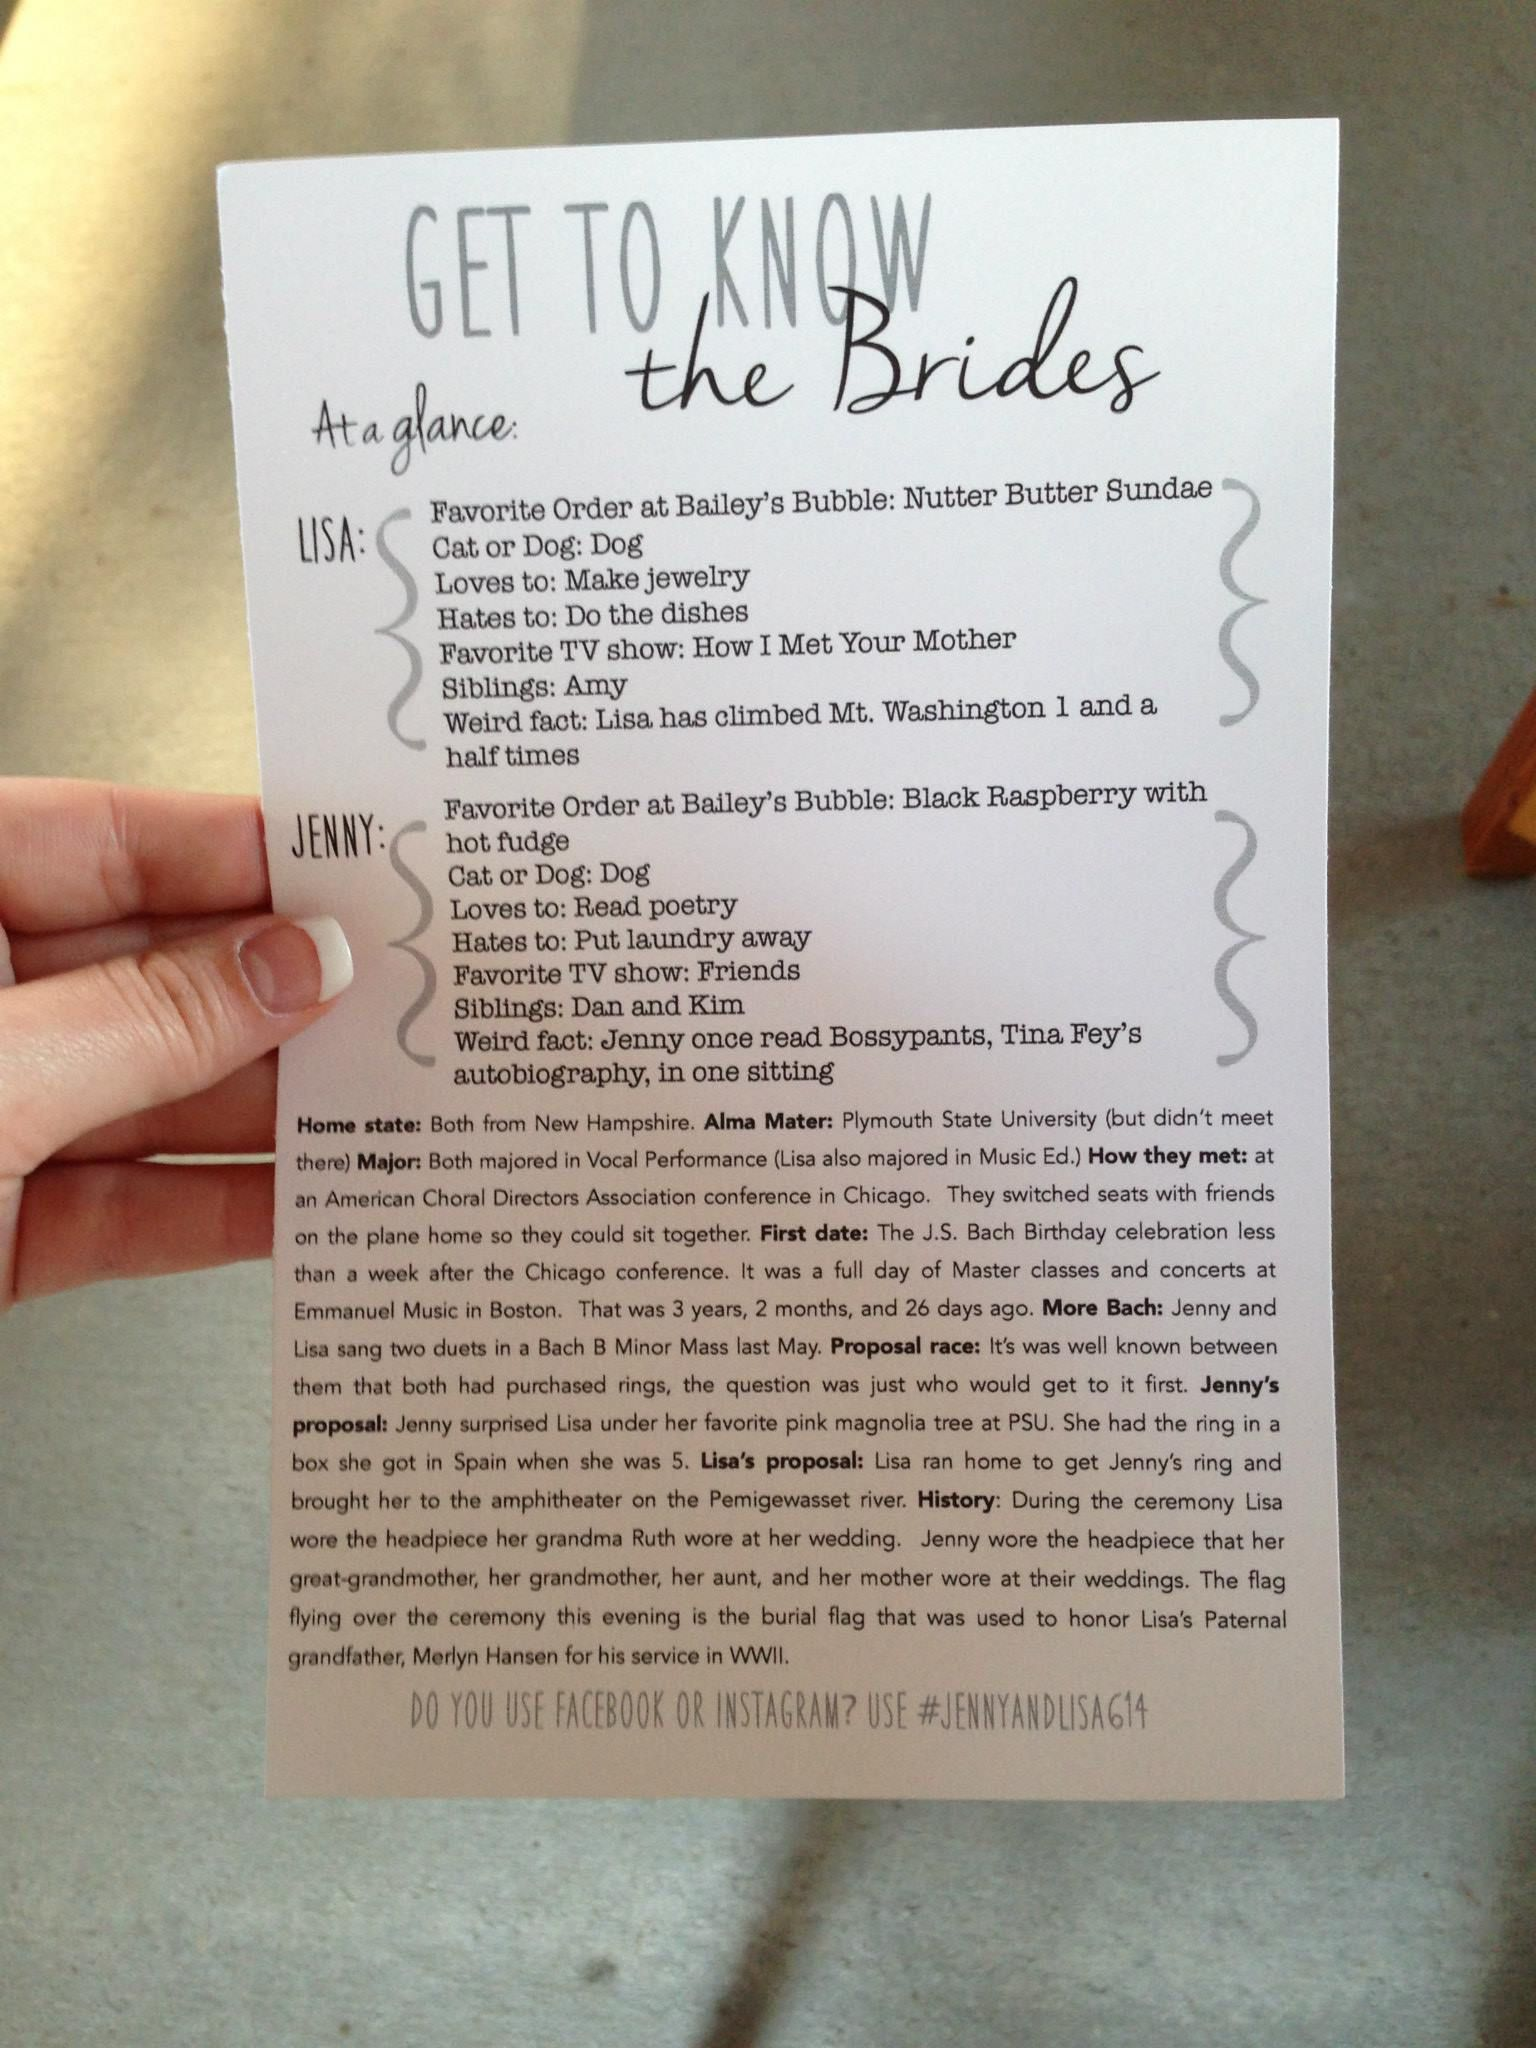 Get to Know the Brides! lesbian wedding 2brides